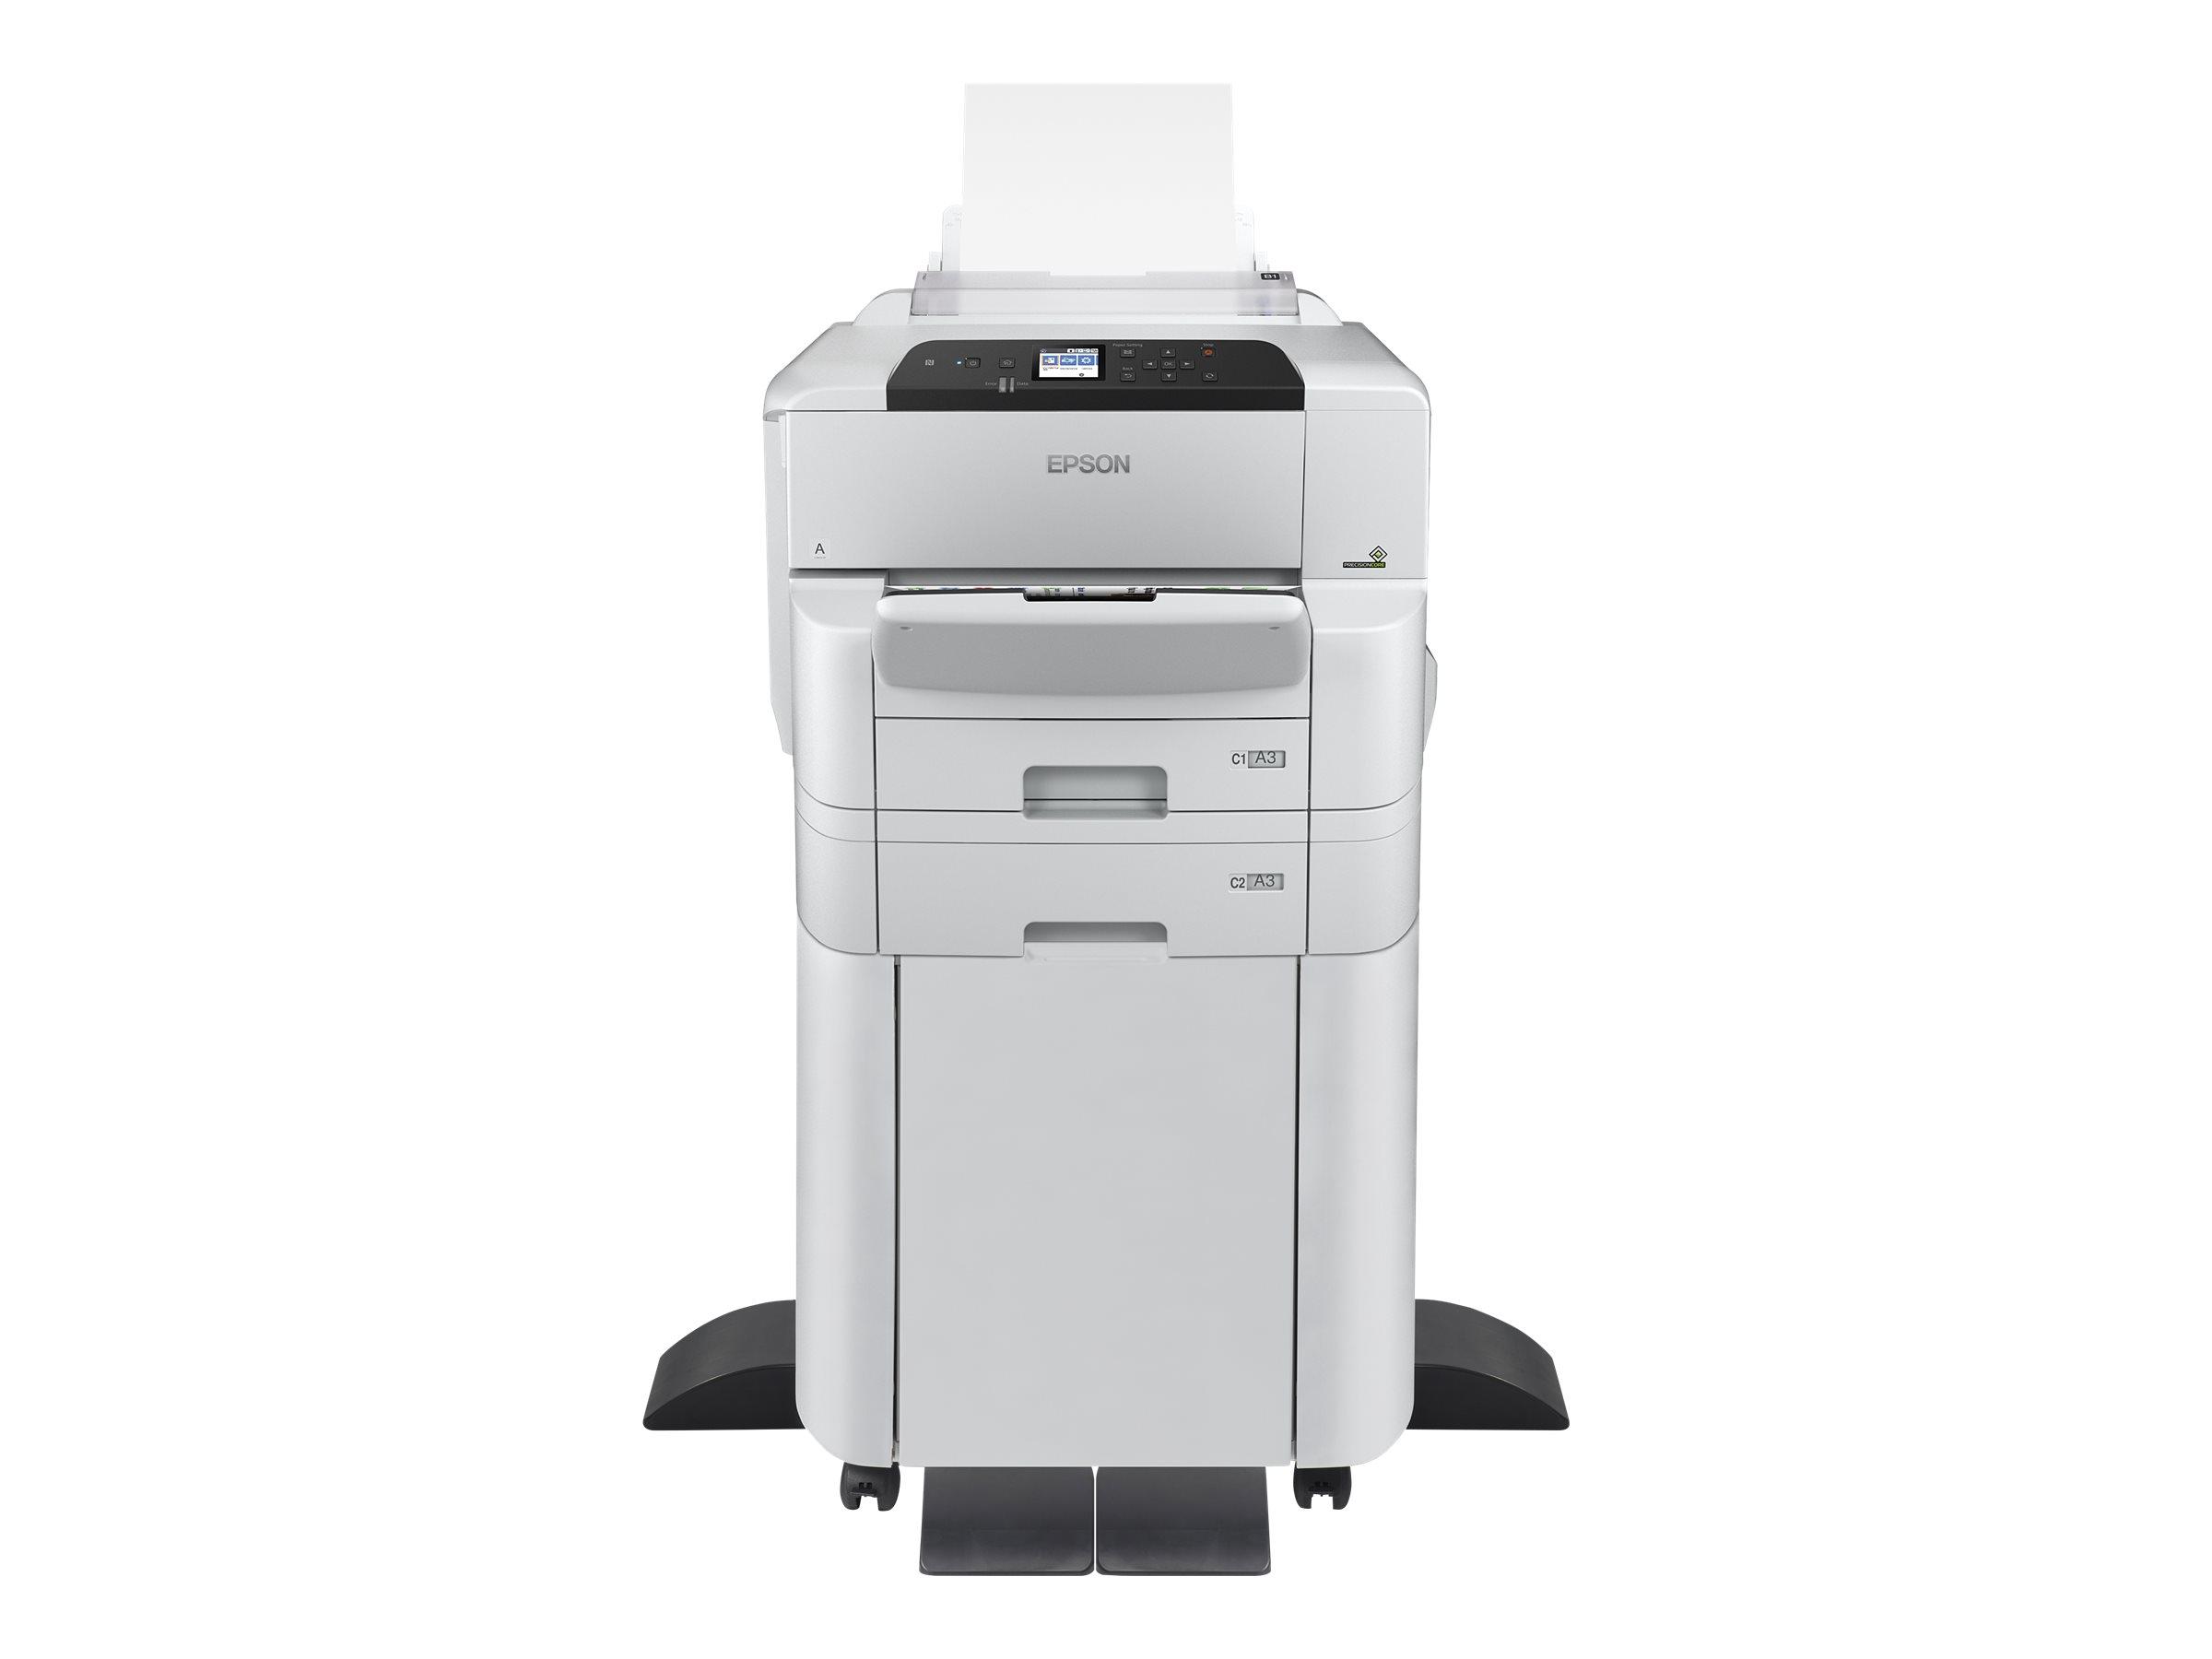 Epson WorkForce Pro WF-C8190DTWC - Drucker - Farbe - Duplex - Tintenstrahl - A3/Ledger